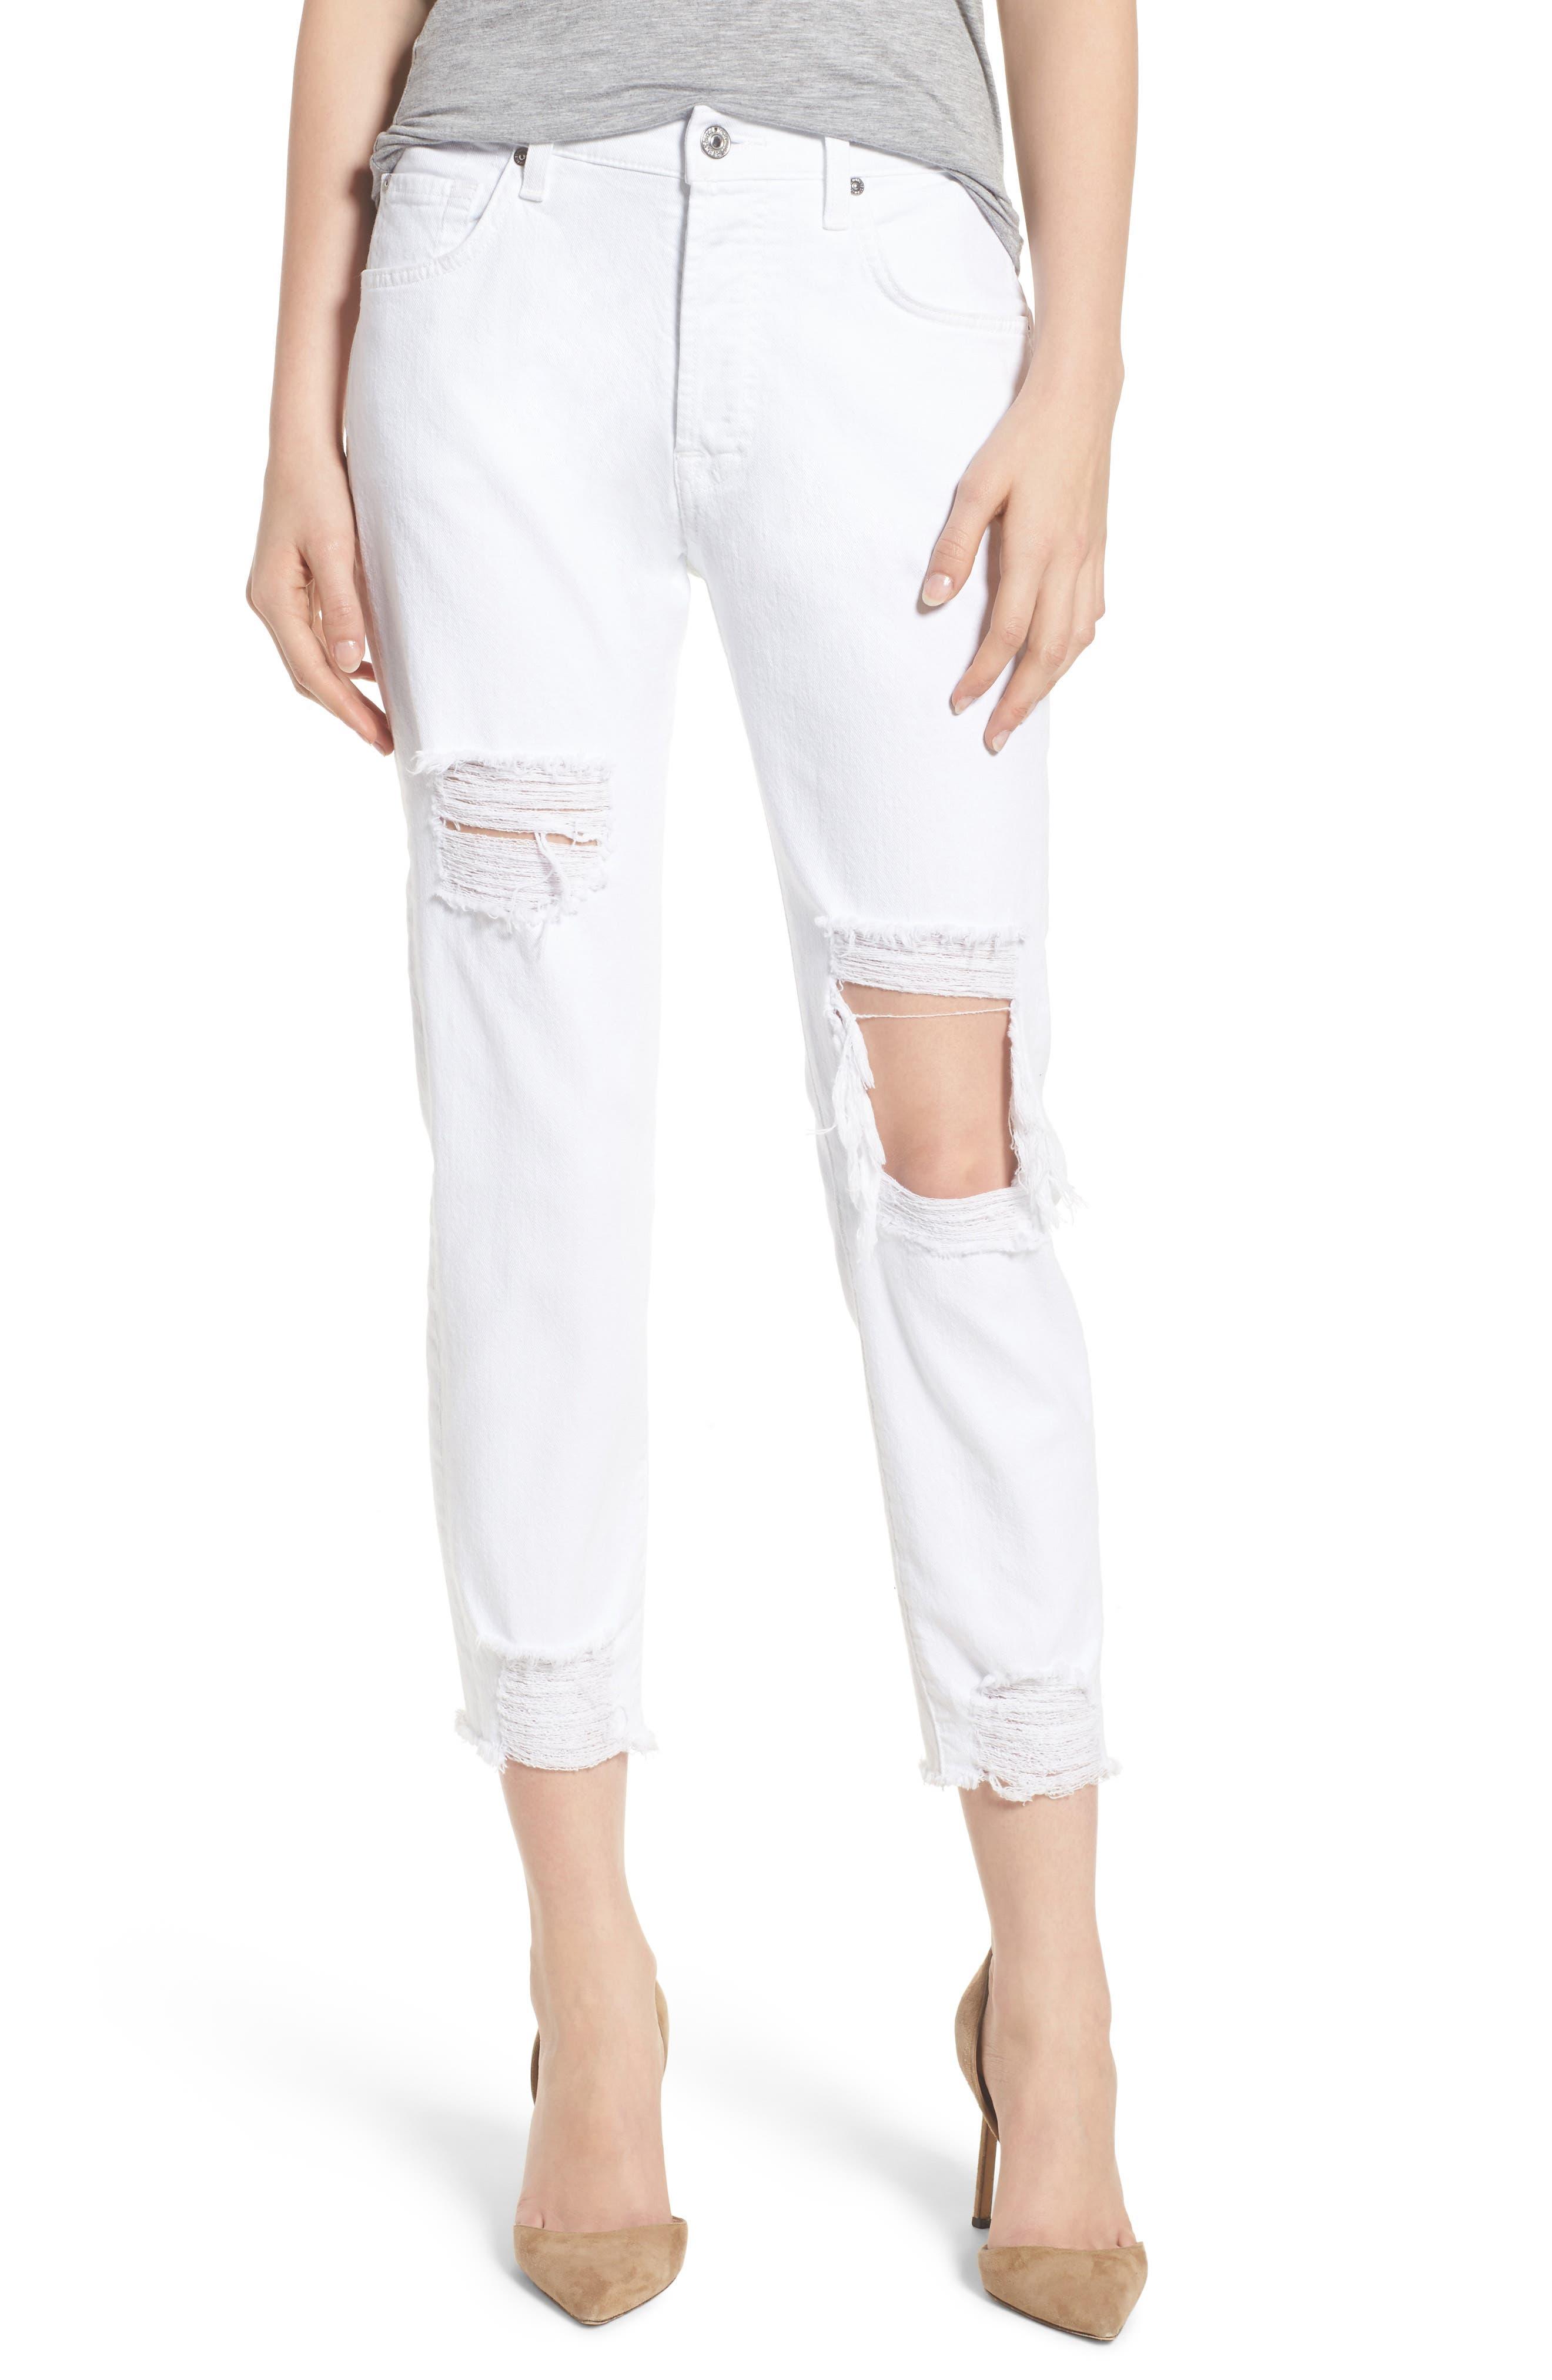 Josefina High Waist Boyfriend Jeans,                         Main,                         color, 101